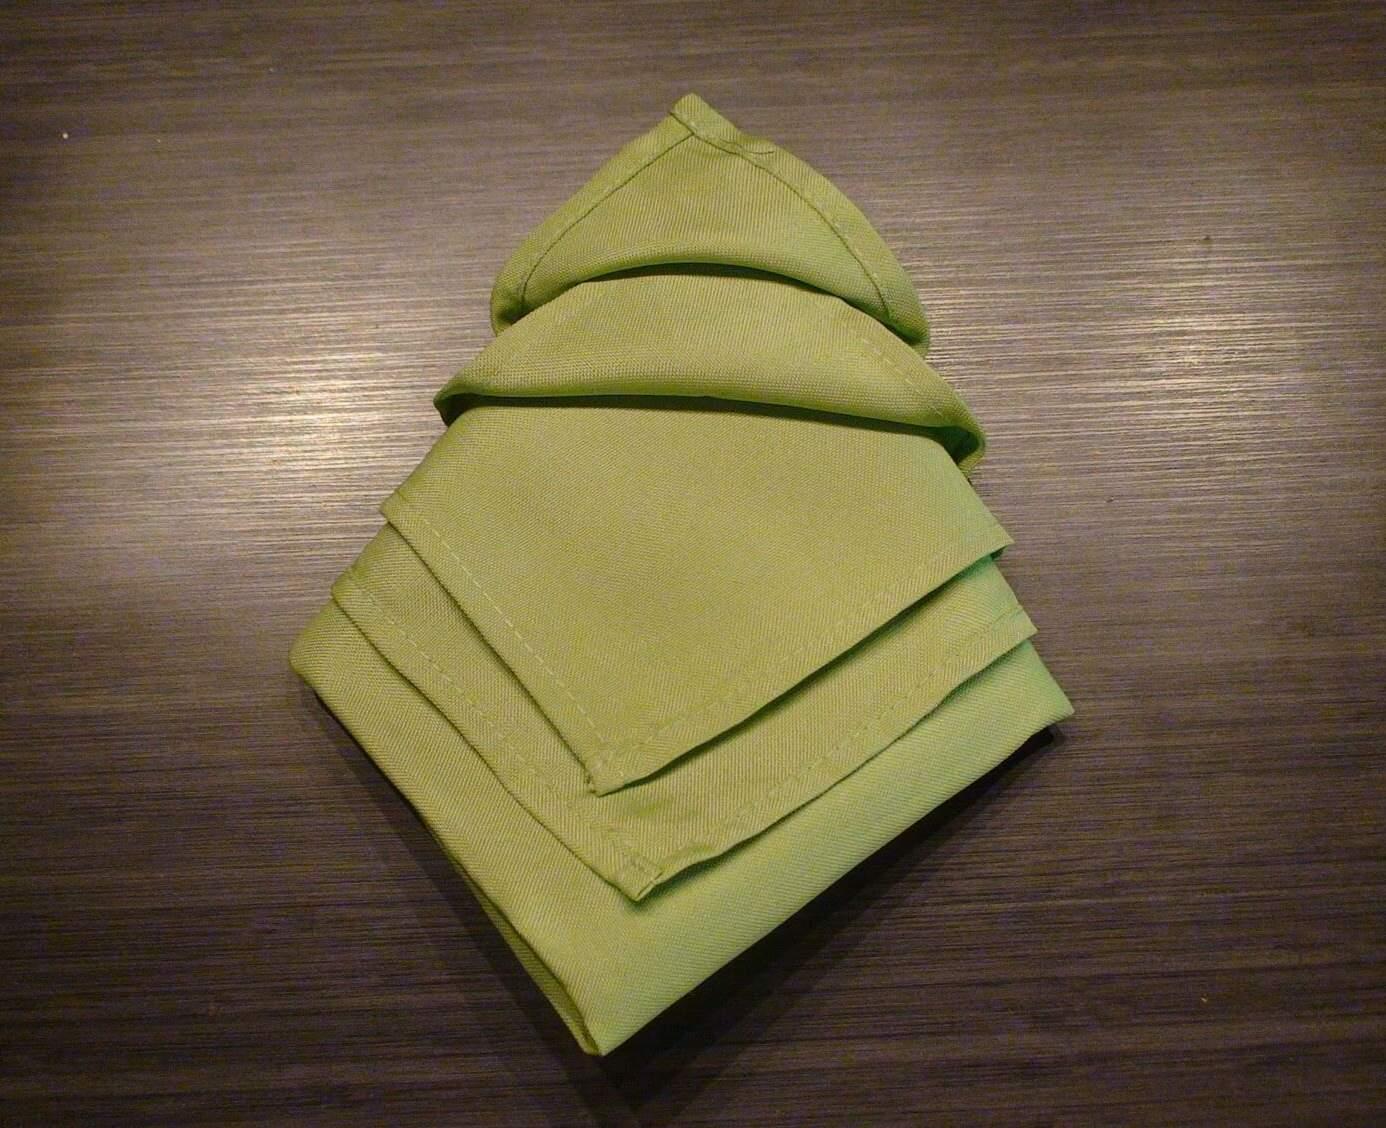 How to Make Christmas Tree Napkin Fold - Step by step (Tutorial)